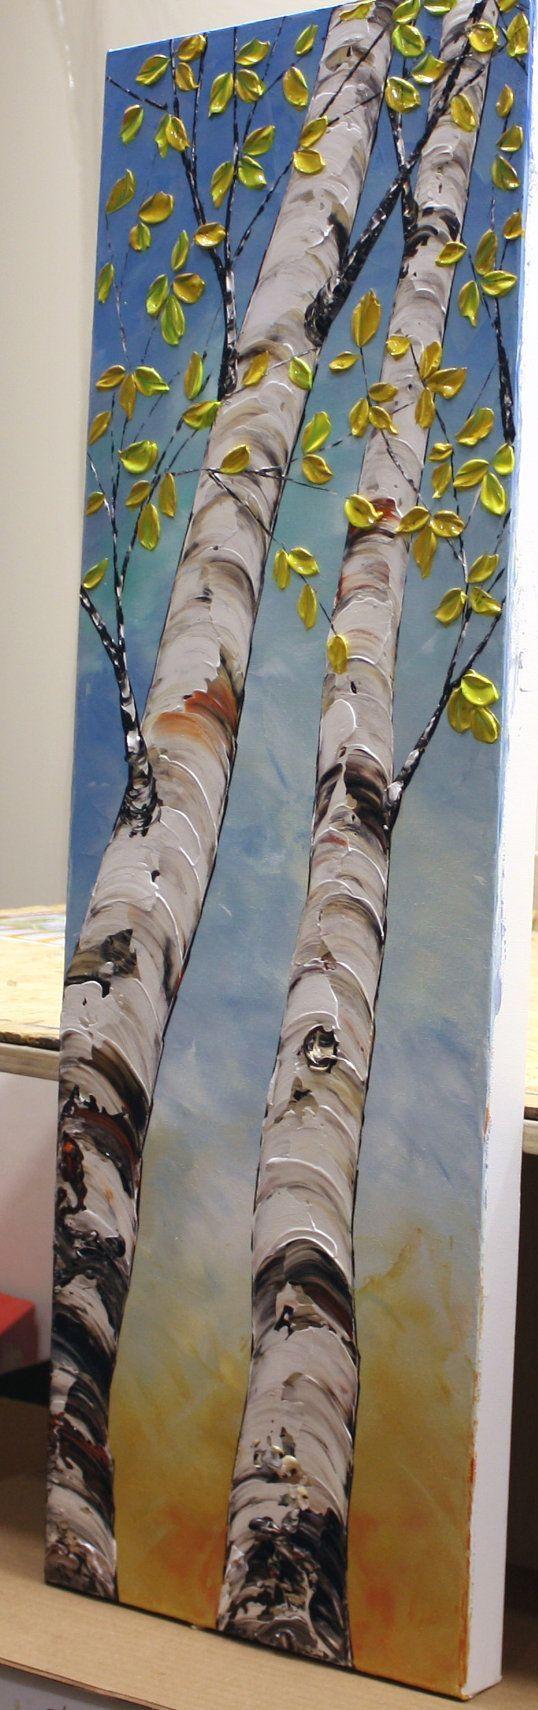 Birch trees with texture painting. Abedul árbol pintura tríptico pared Arte Original por NataSgallery